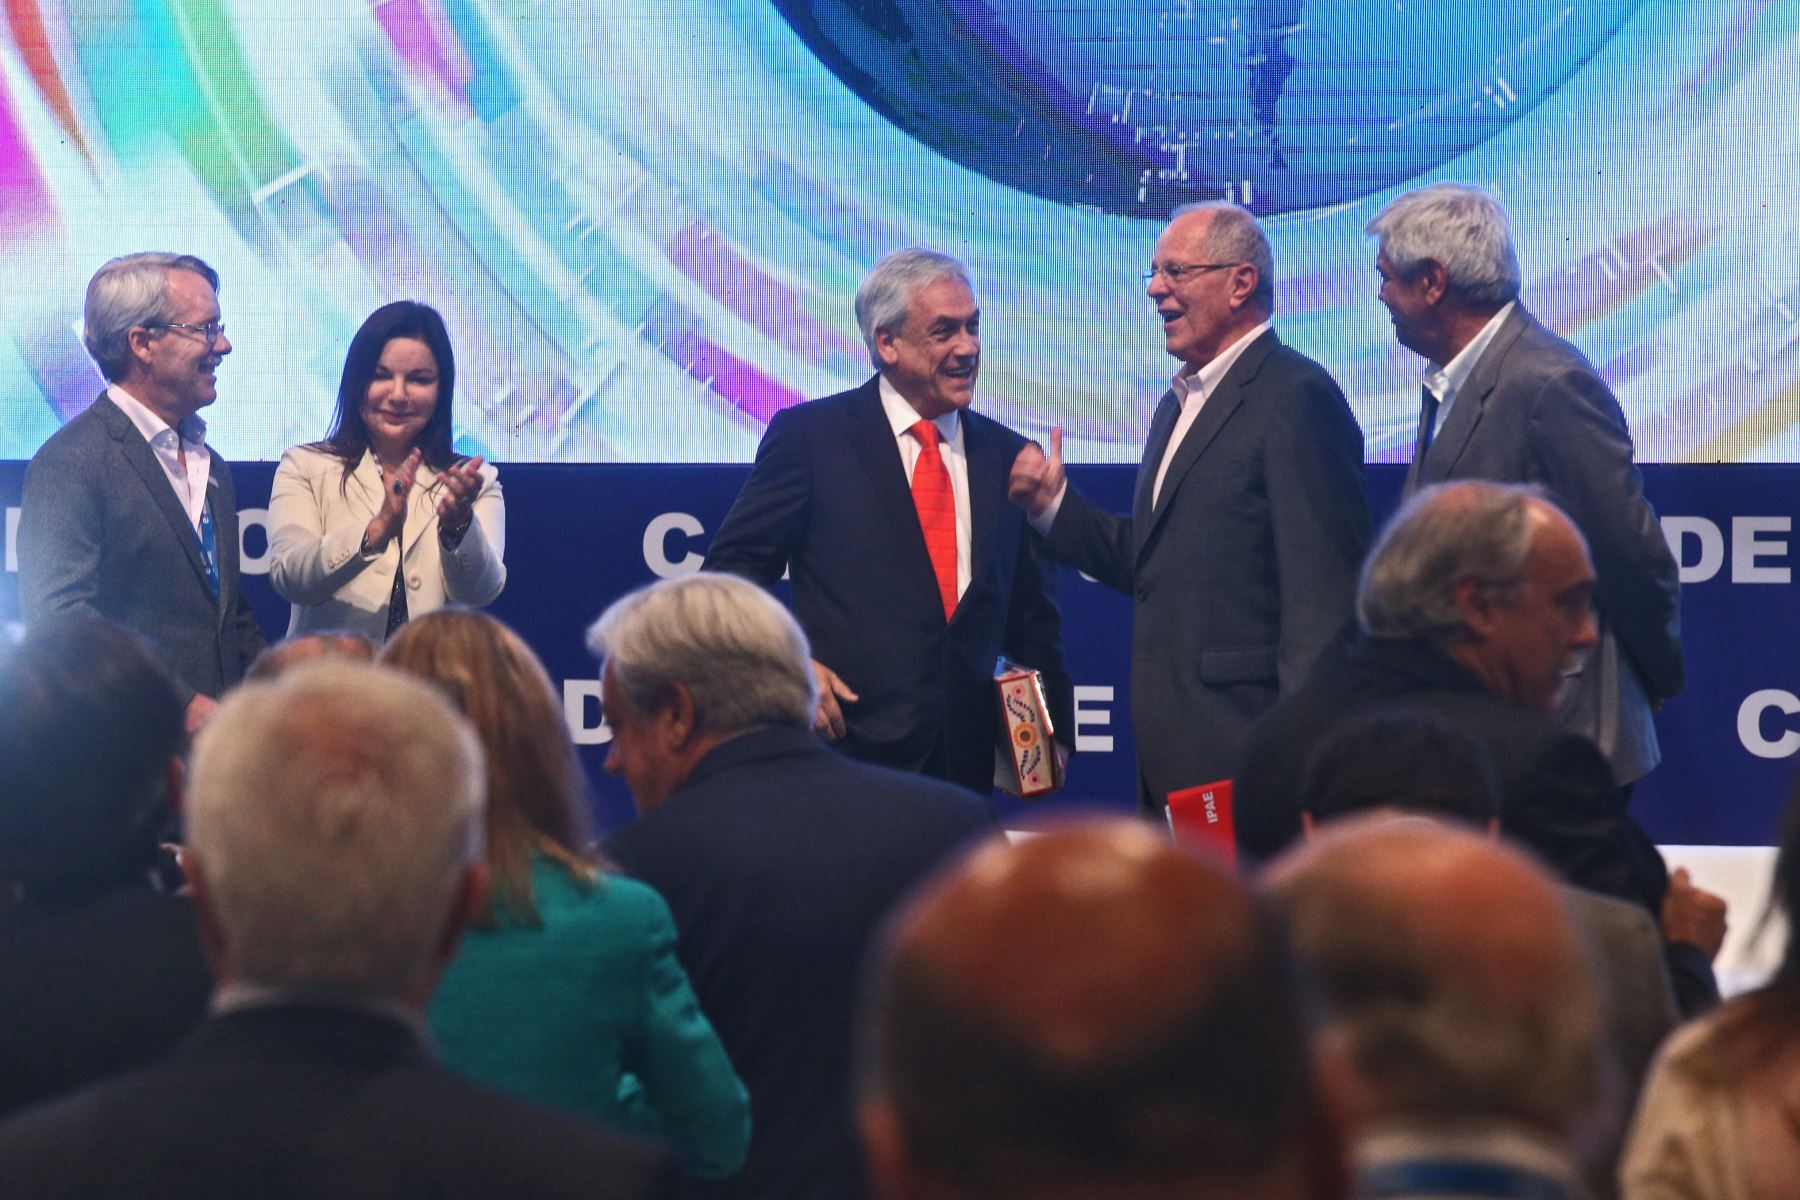 La primera actividad como presidente de Sebastián Piñera — Sename